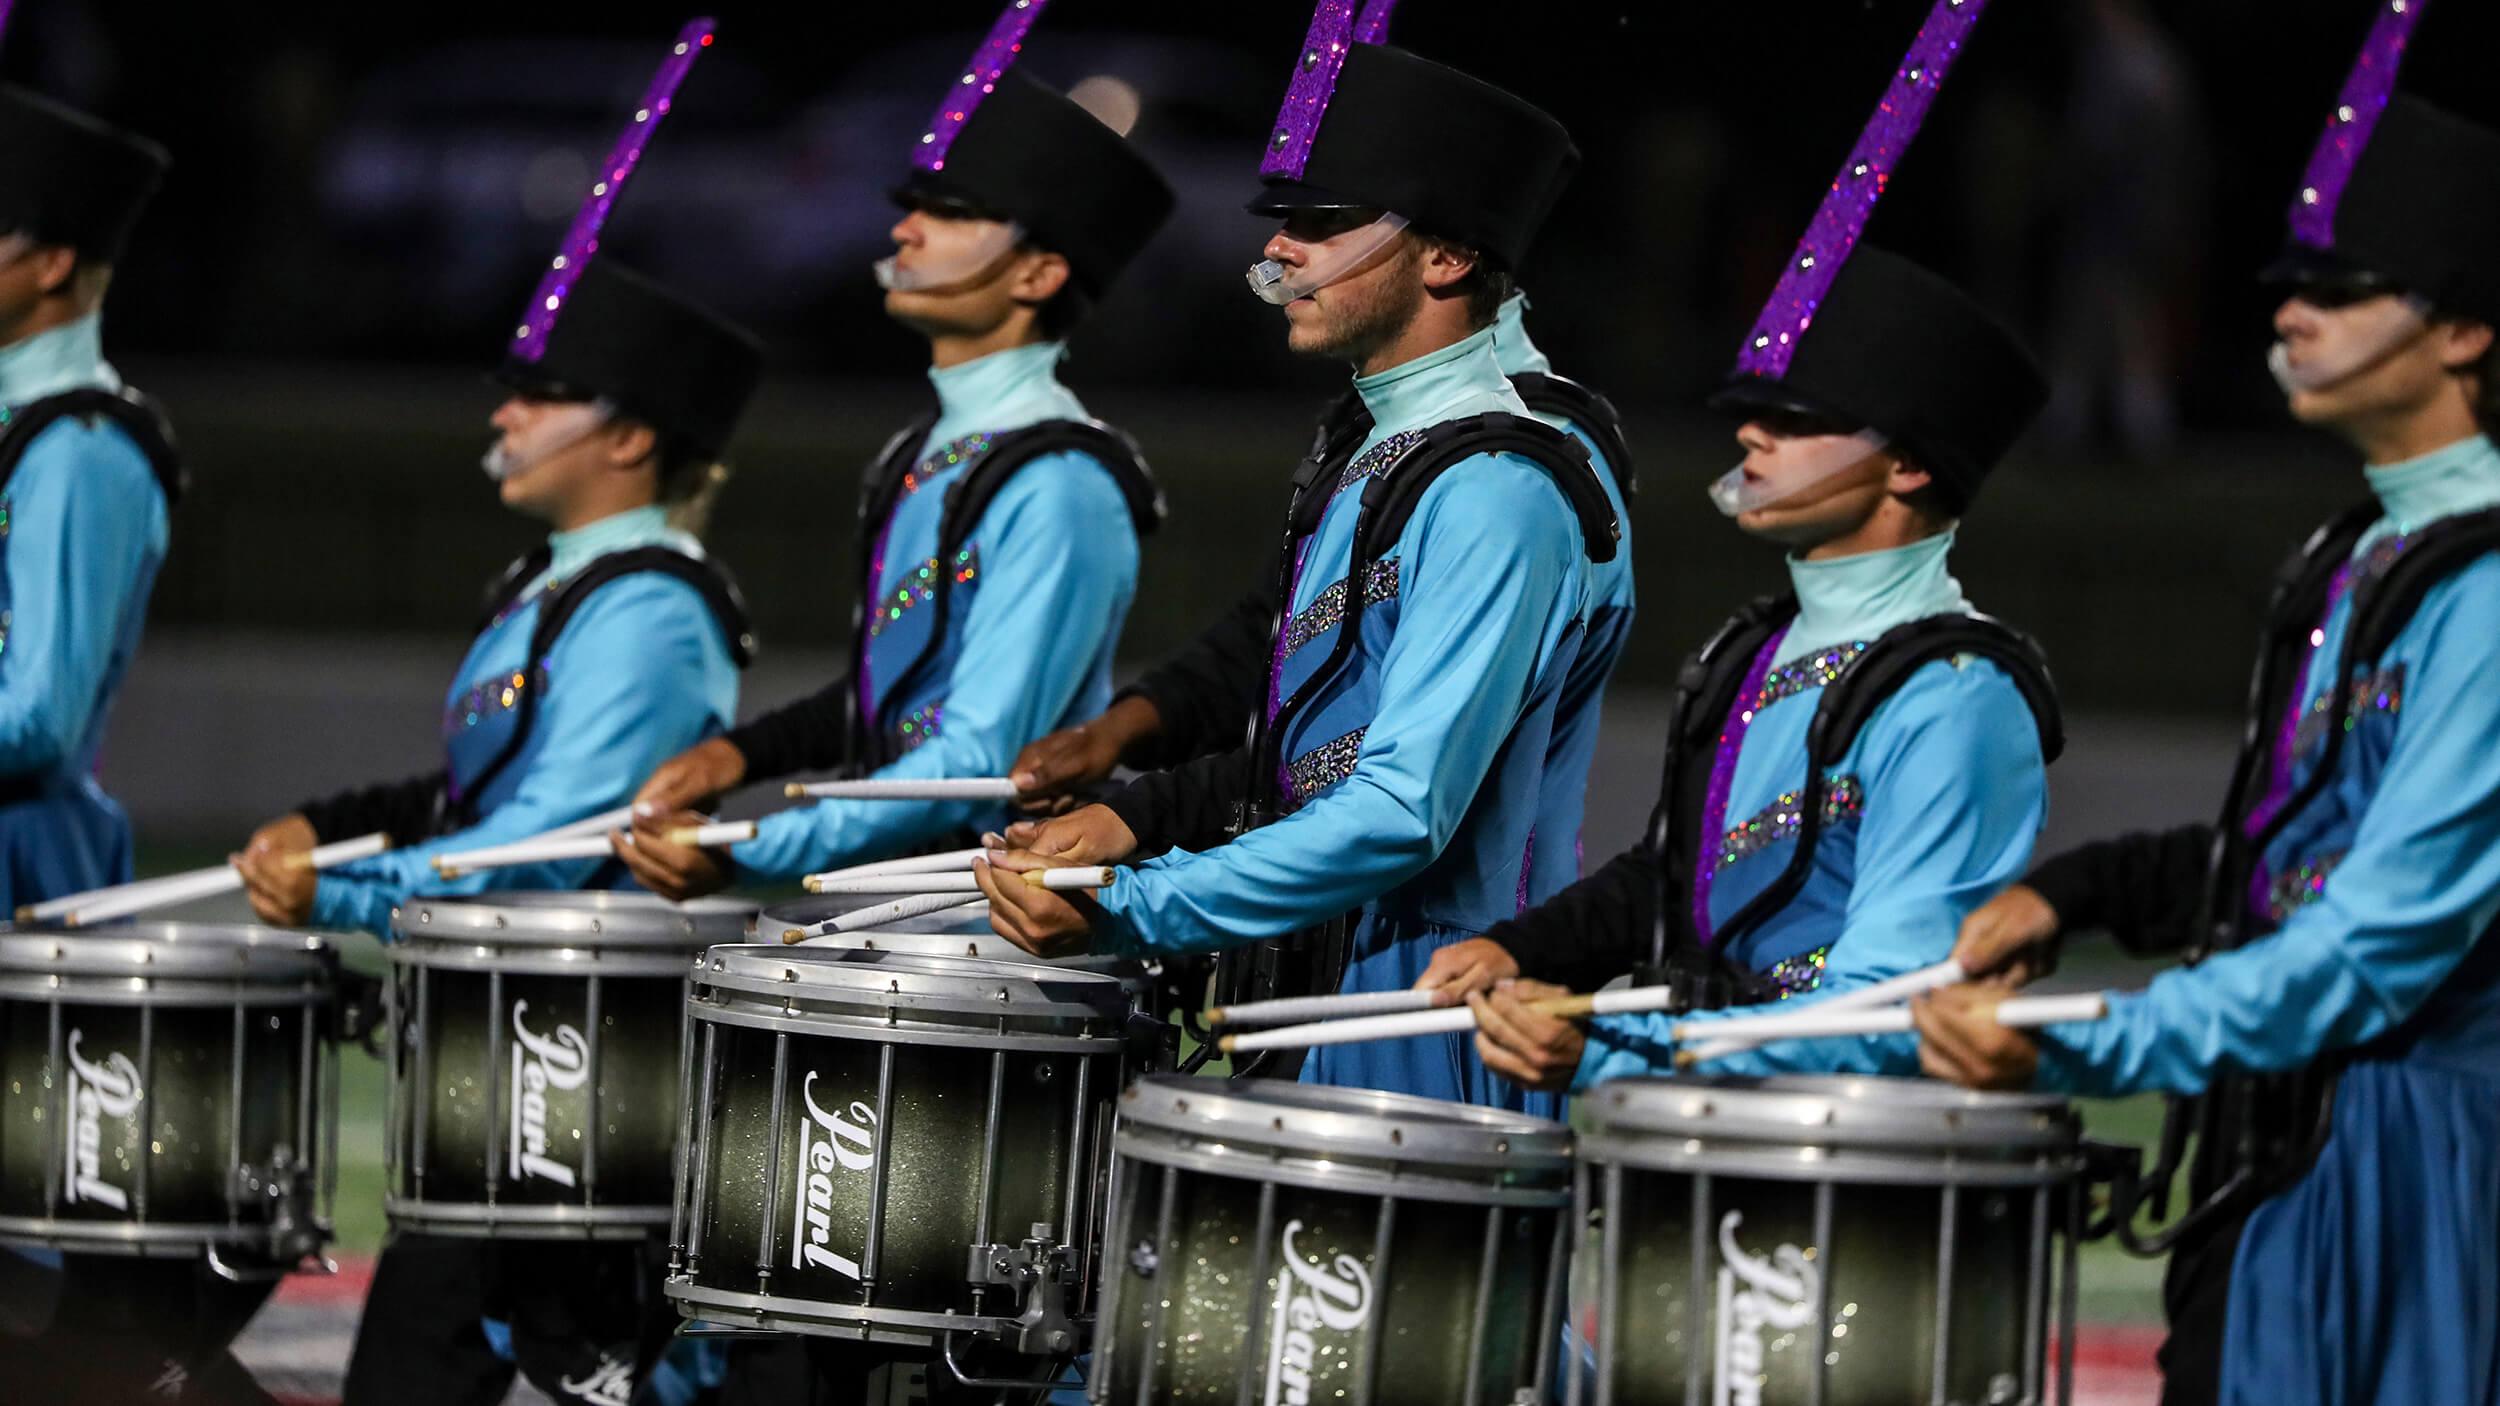 Drums Across Cajun Field